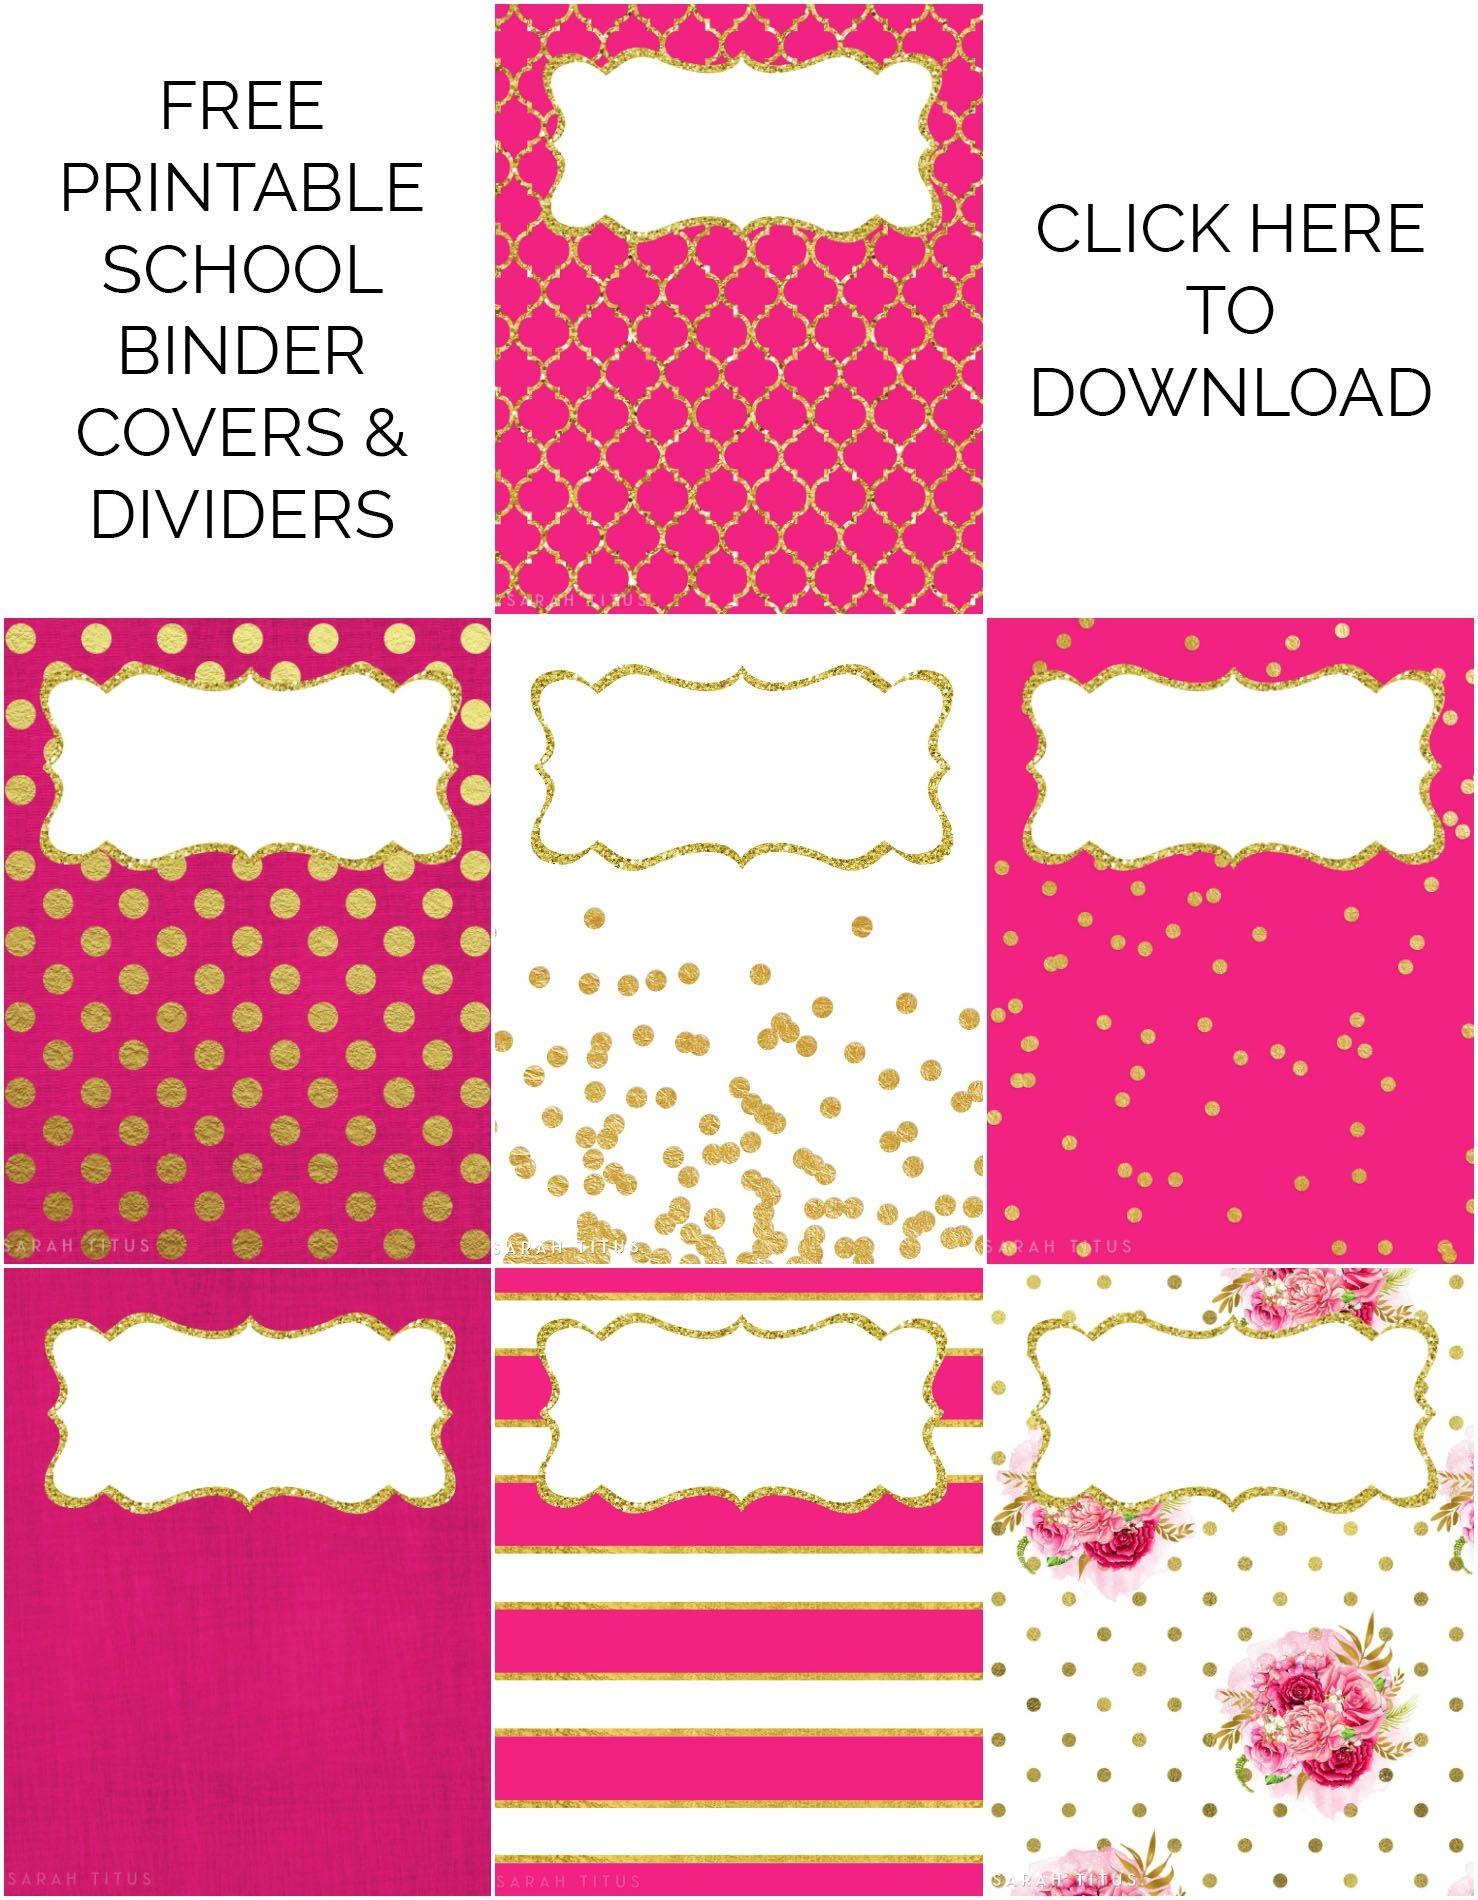 Binder Covers / Dividers Free Printables | Plans | Binder Covers - Free Printable Dividers